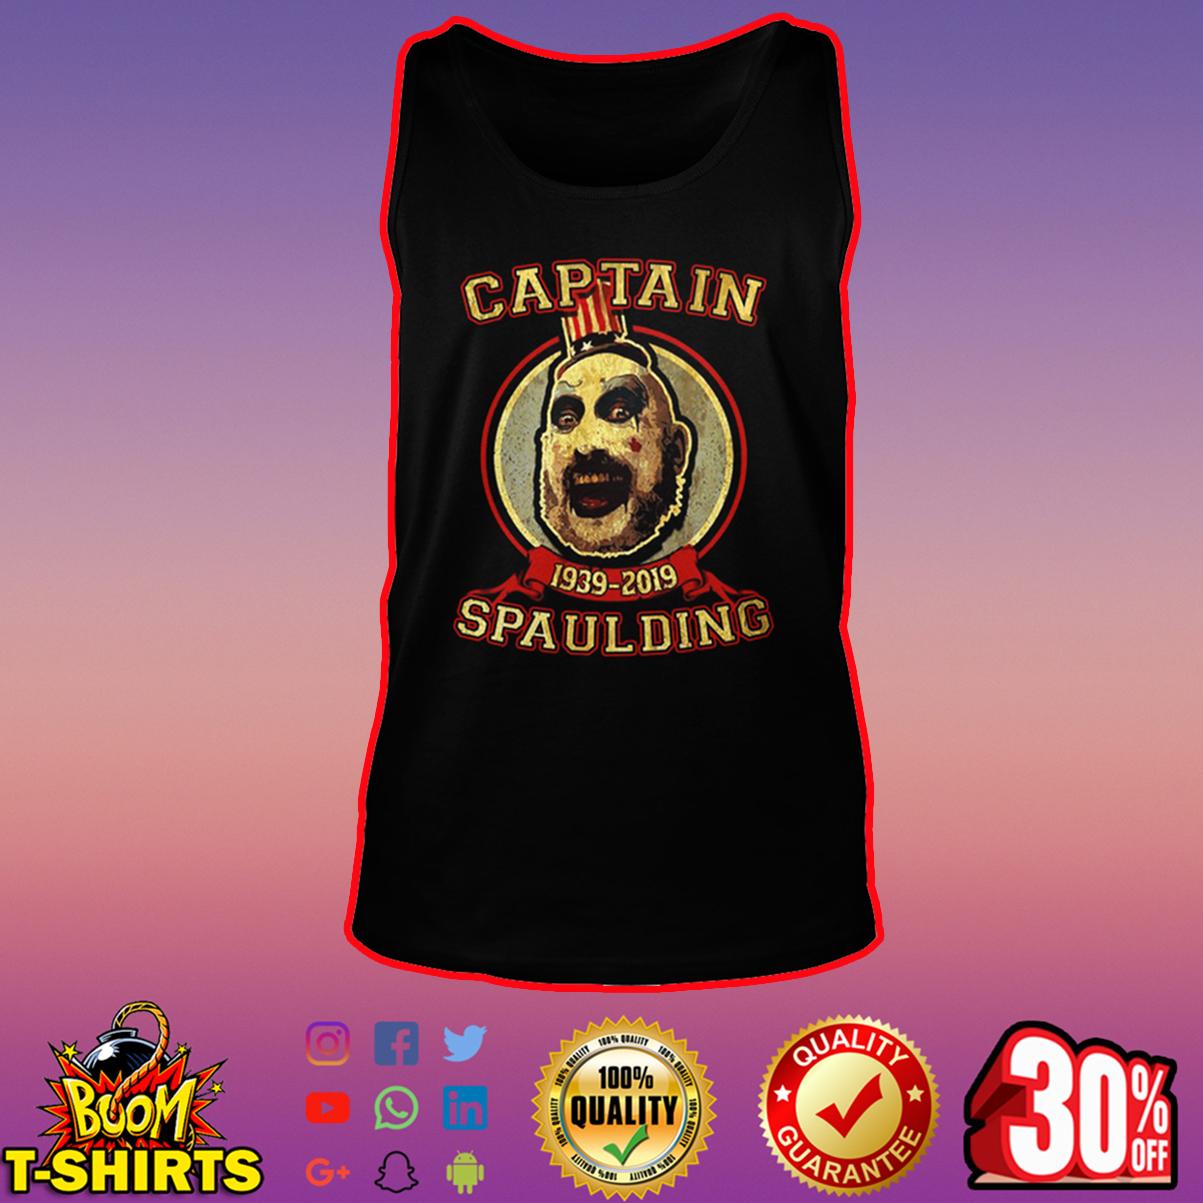 Captain Spaulding 1939-2019 tank top